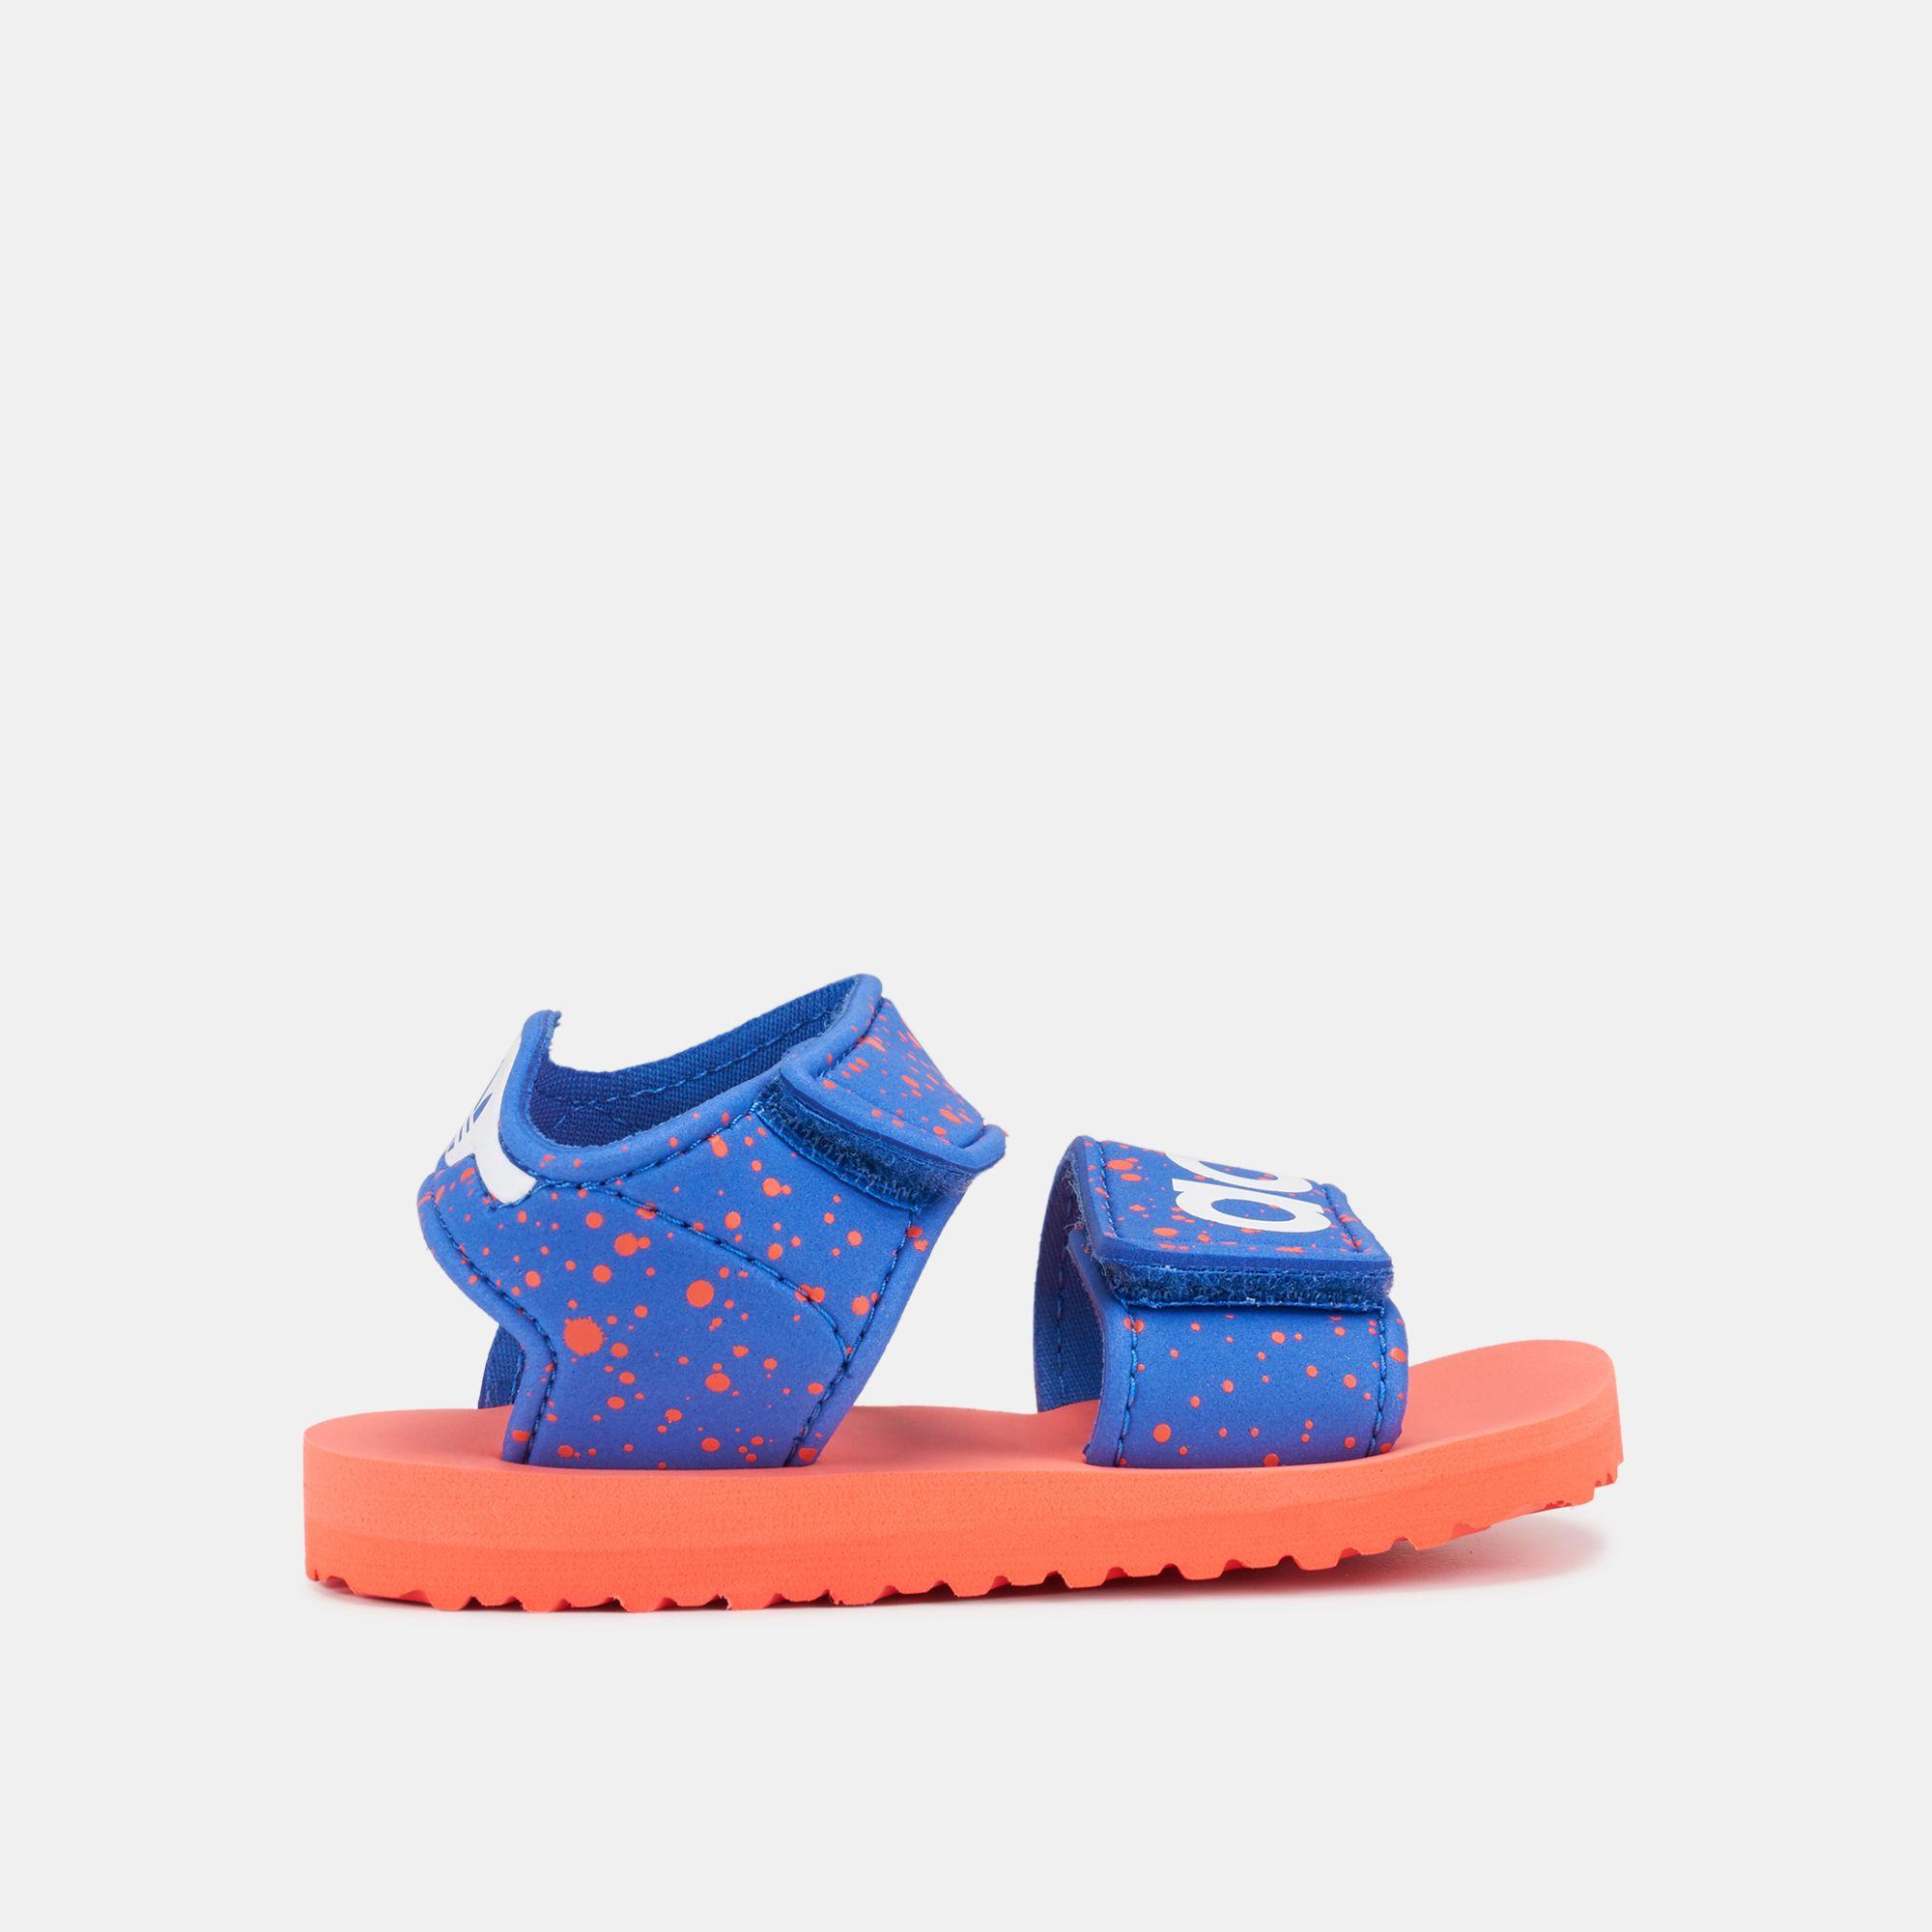 Espinoso virtual Razón  почти попечител неактивен adidas beach sandals - kristysellarspoleartist.com